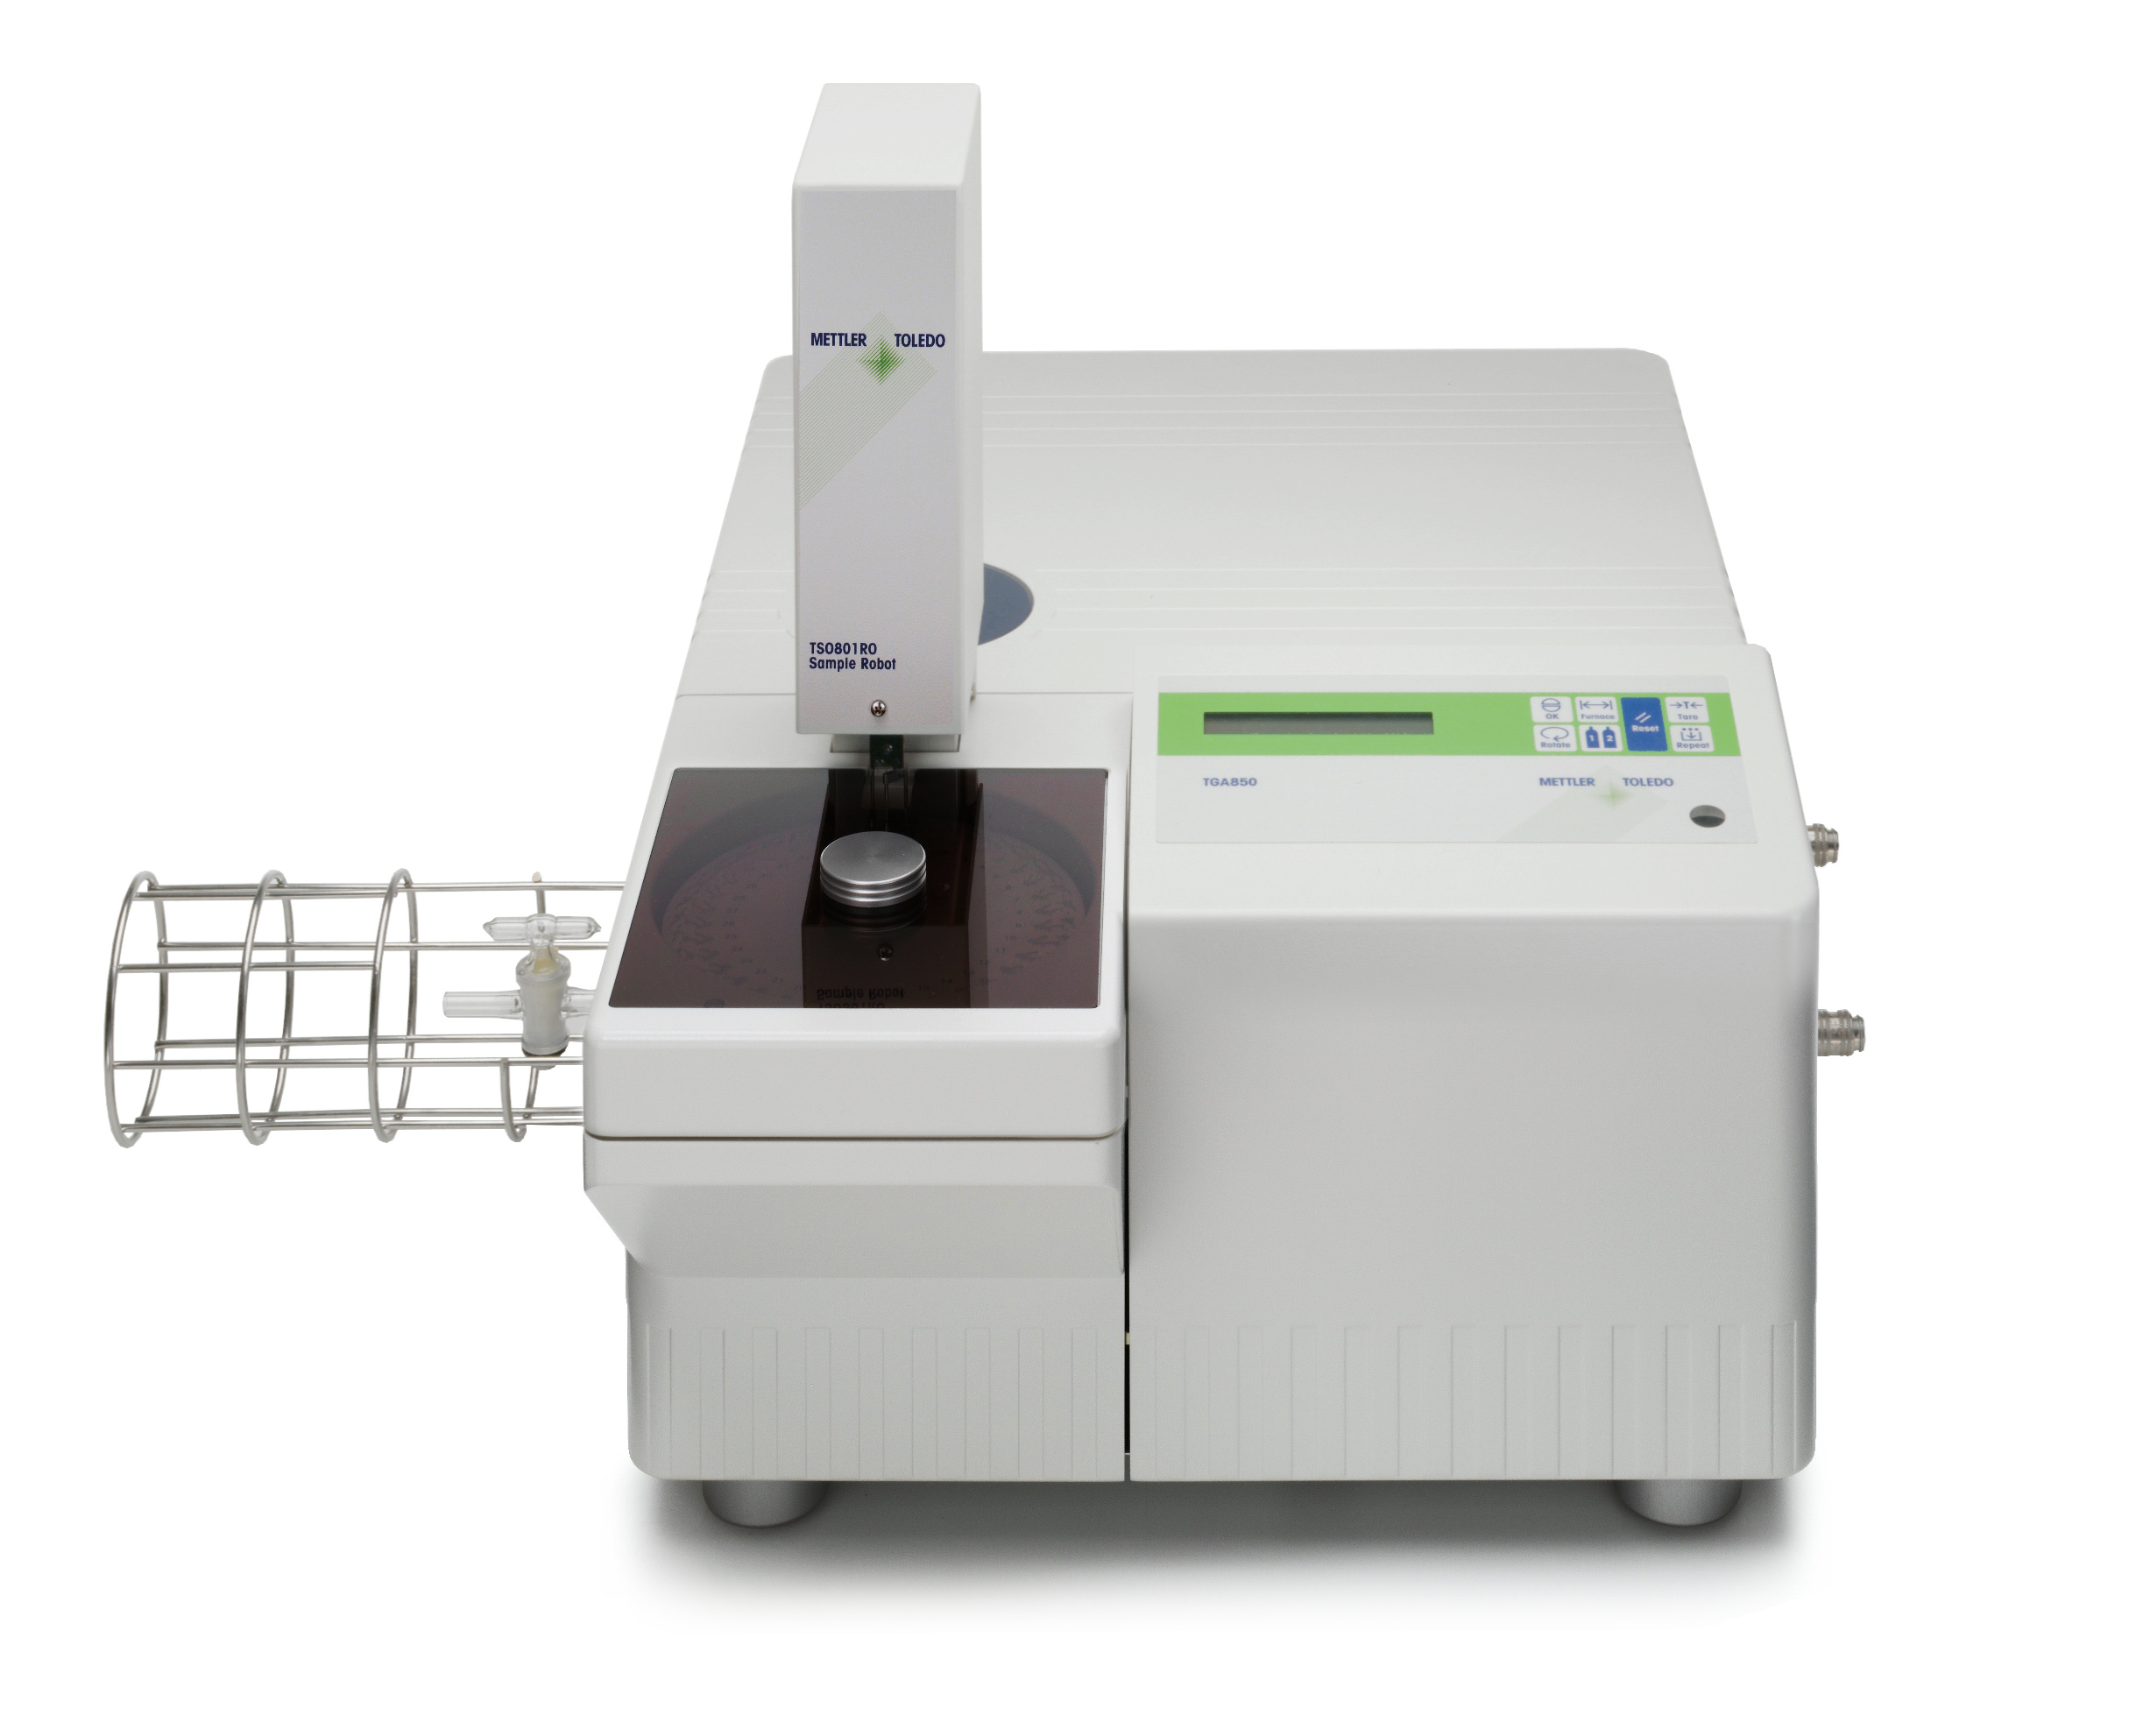 Thermo-gravimetrische Analyse | Mettler Toledo TGA/SDTA 851E | Polymer Engineering Bayreuth